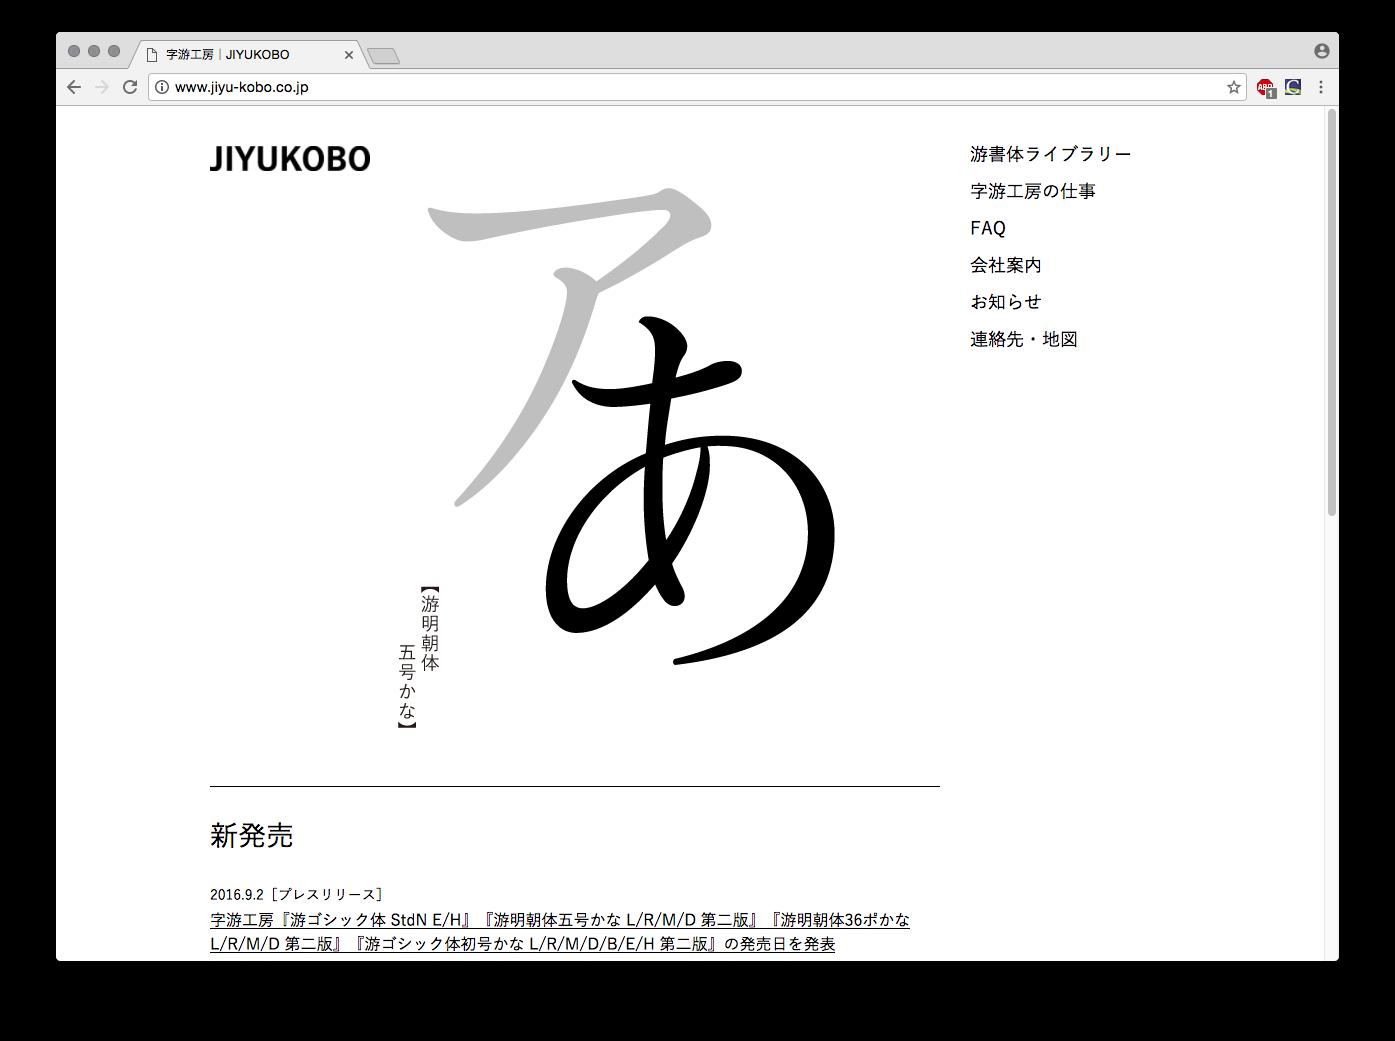 http://www.jiyu-kobo.co.jp